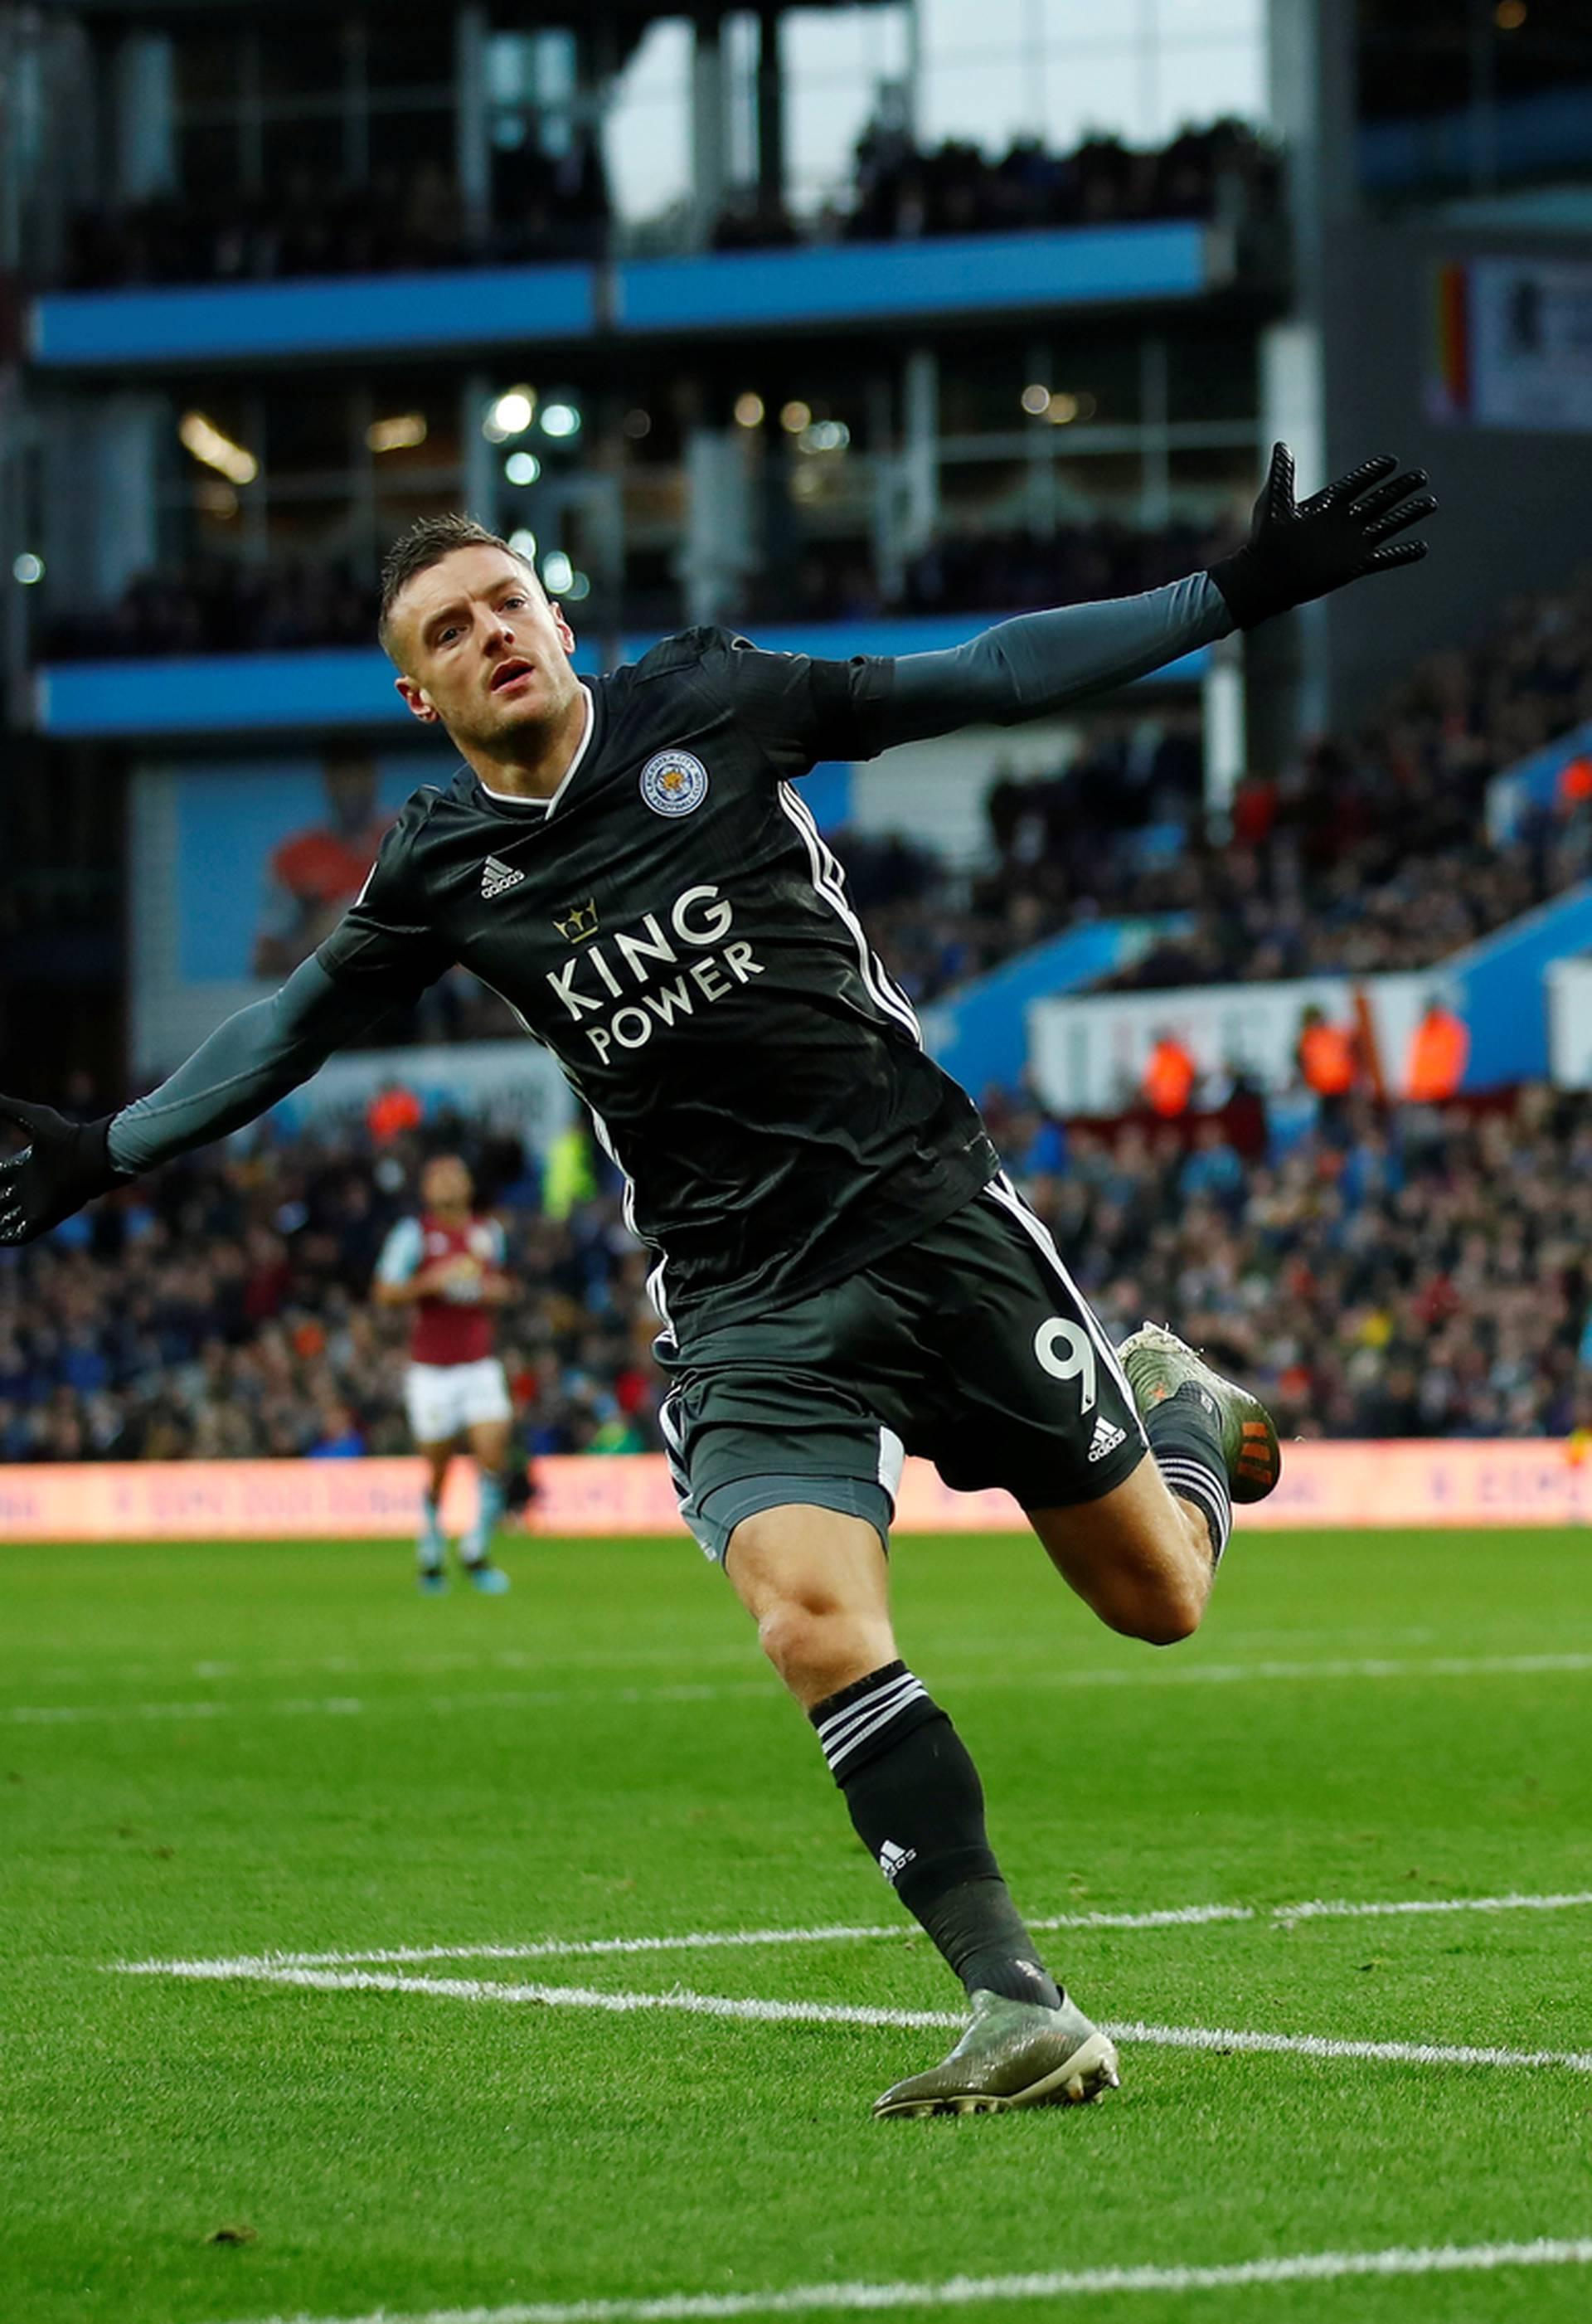 Čudesni Leicester opet briljira:  Vardy kao prije Van Nistelrooy